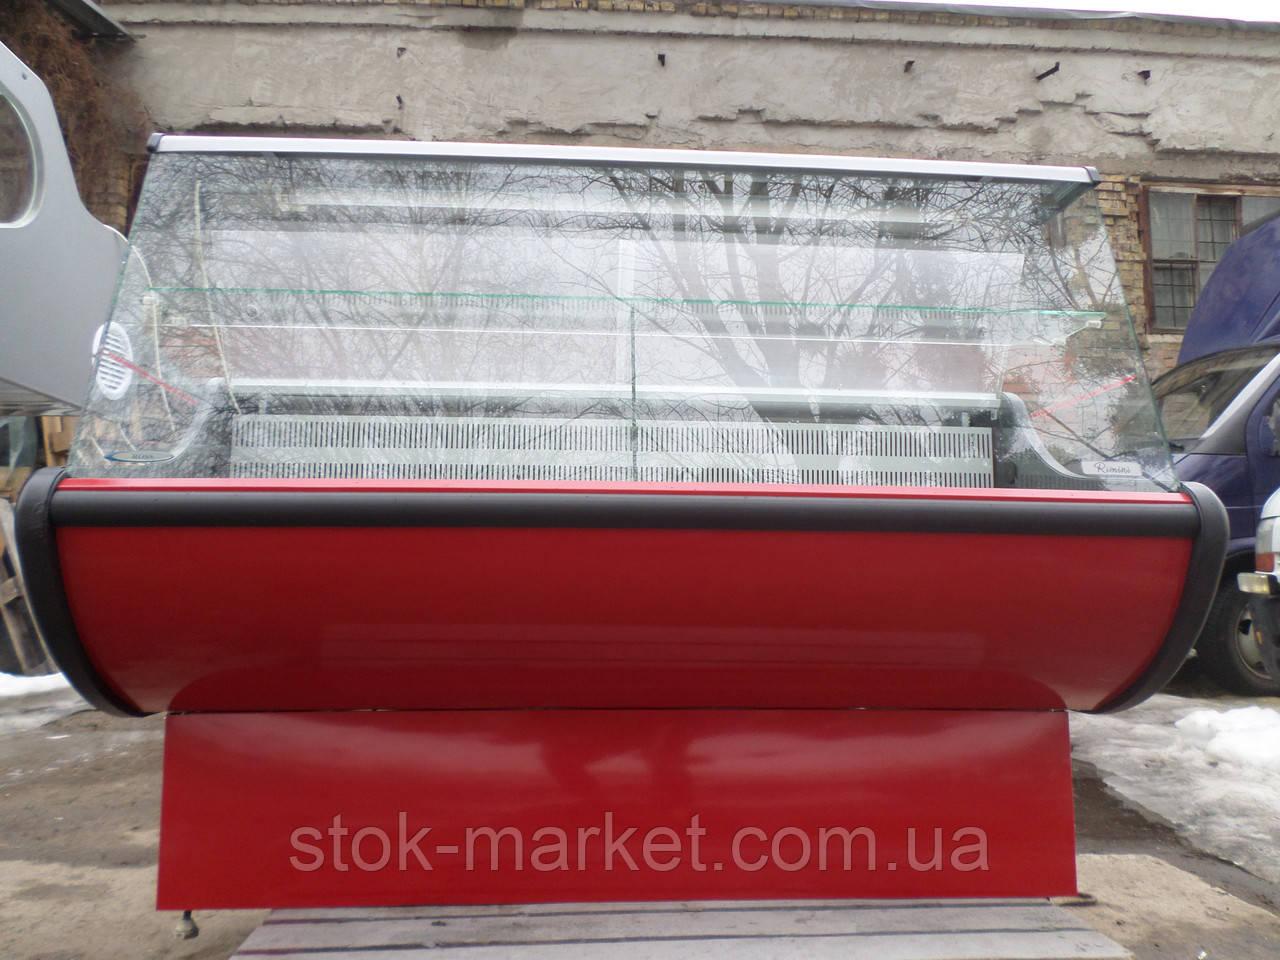 Витрина  РОСС Rimini 1.50 м. б/у., гастрономическая витрина бу.